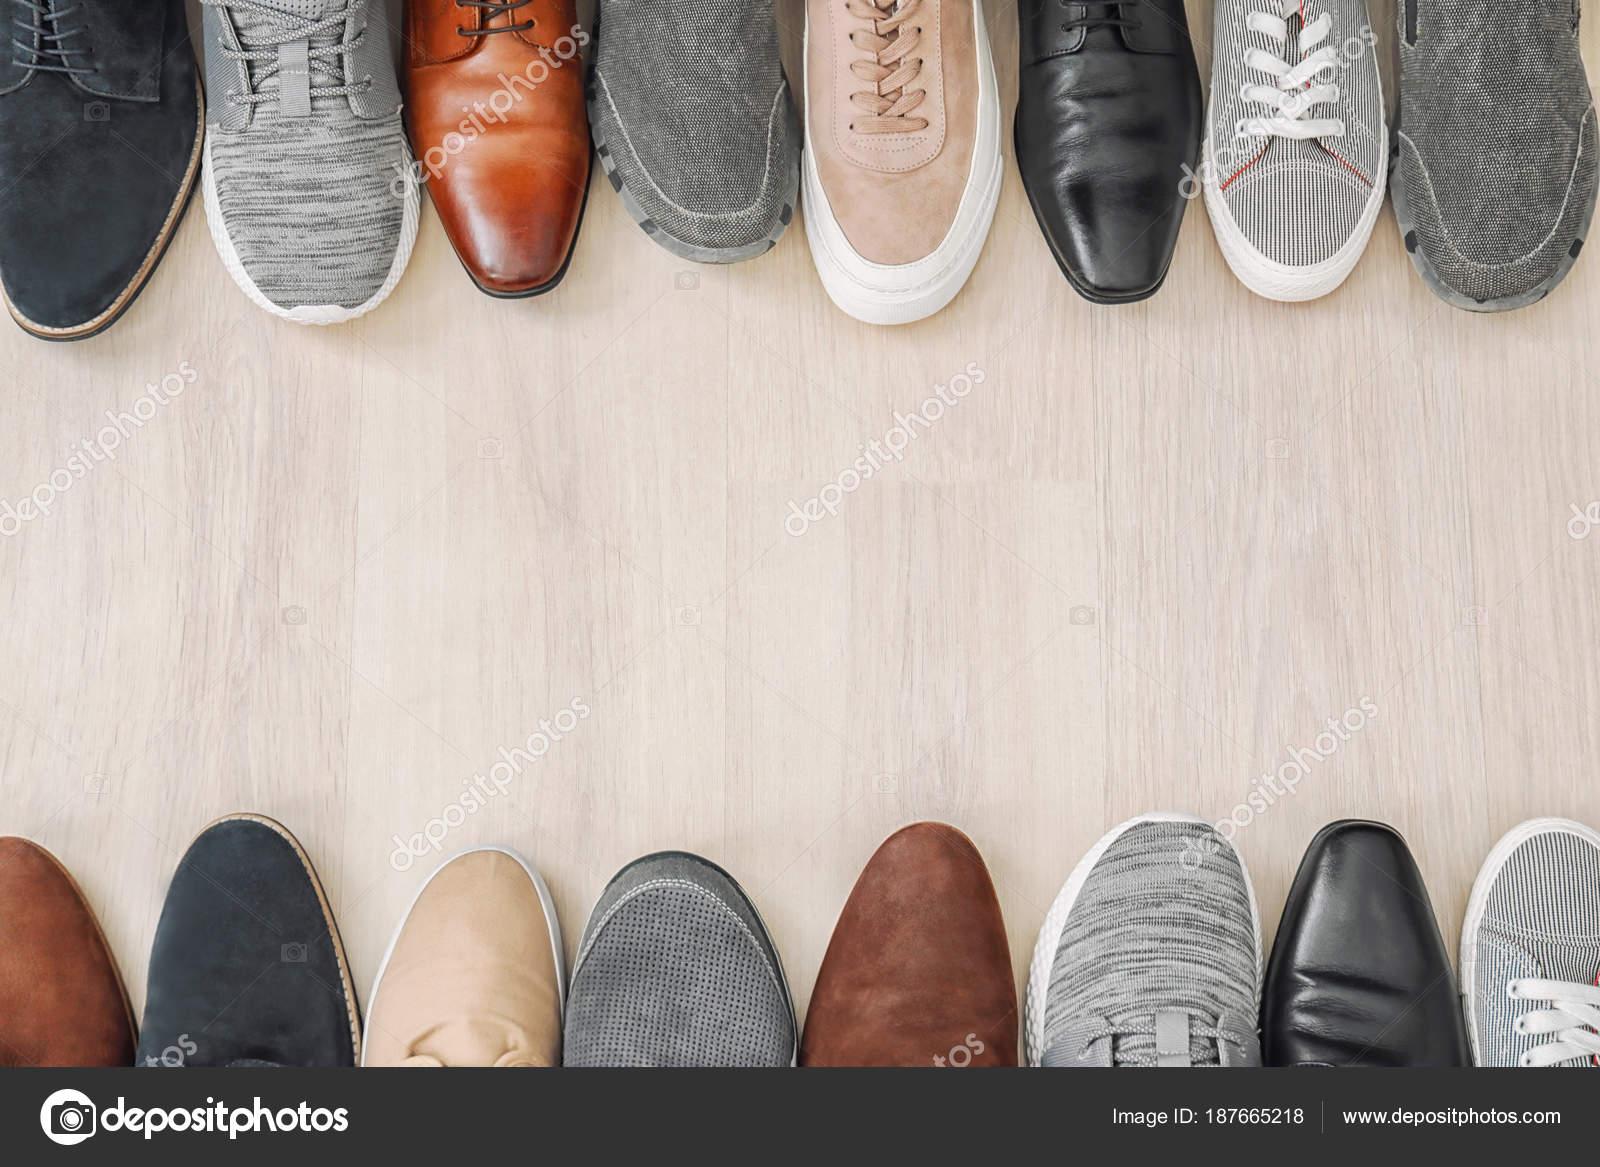 fe540830e3c Διαφορετικά παπούτσια αρσενικό — Φωτογραφία Αρχείου © belchonock ...